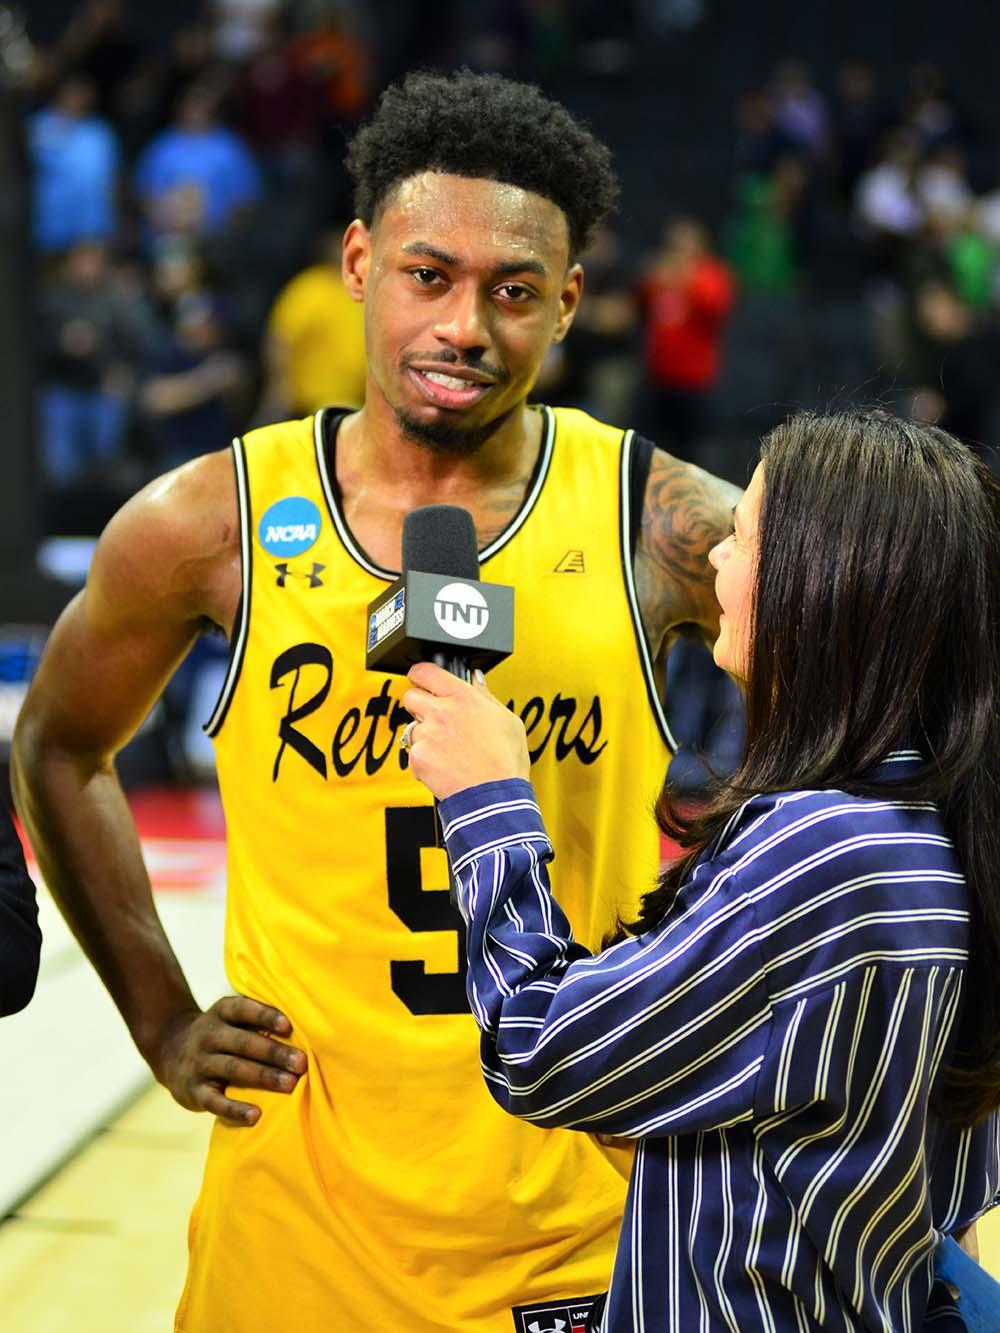 Retrievers basketball player interviewed by TNT